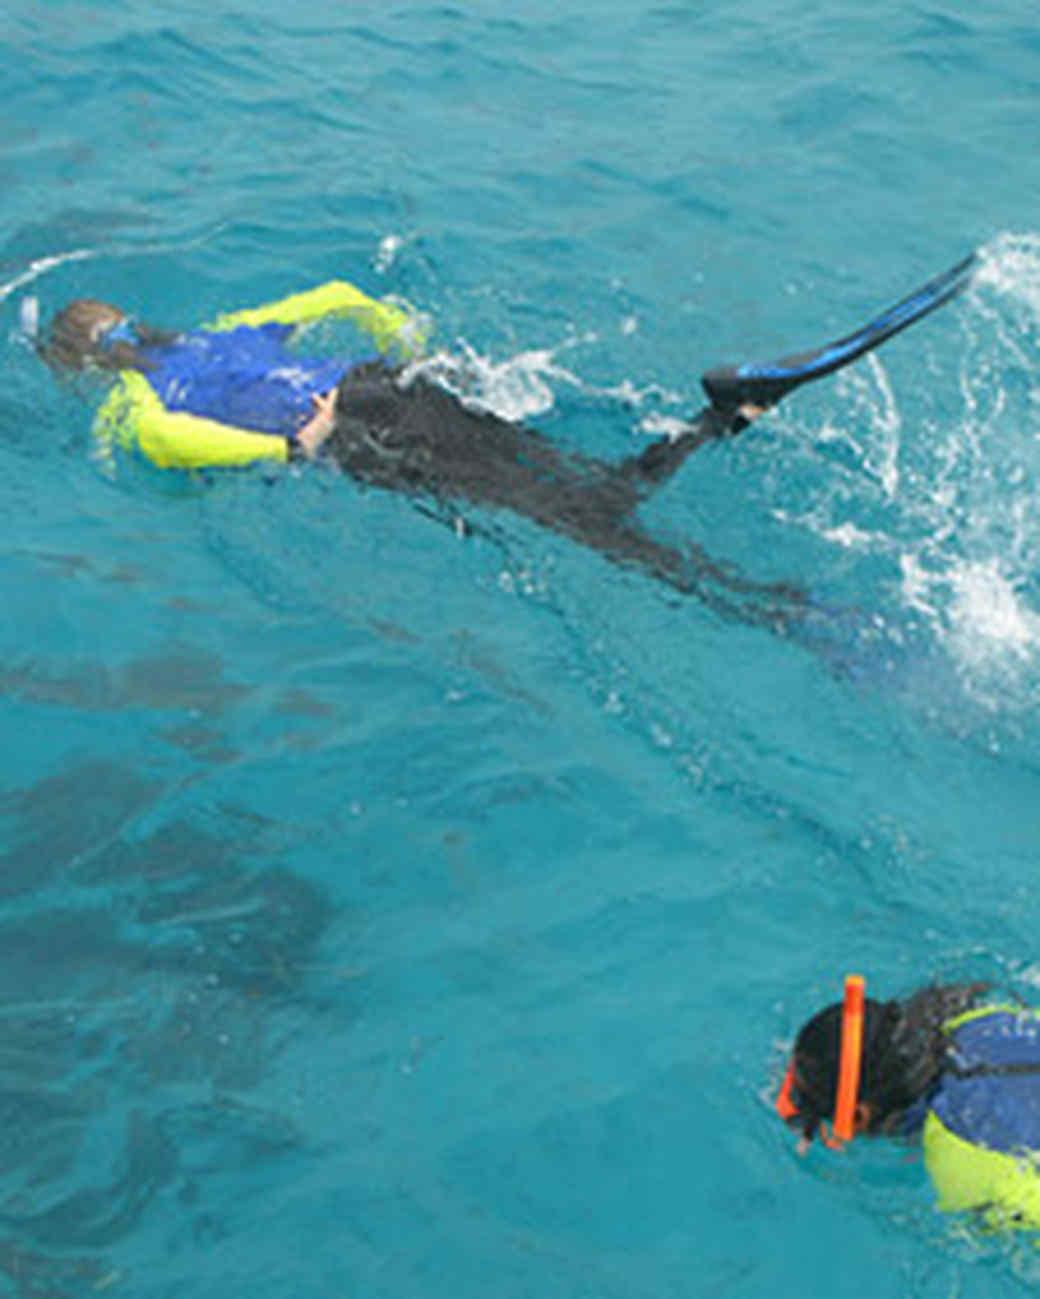 martha_snorkeling.jpg